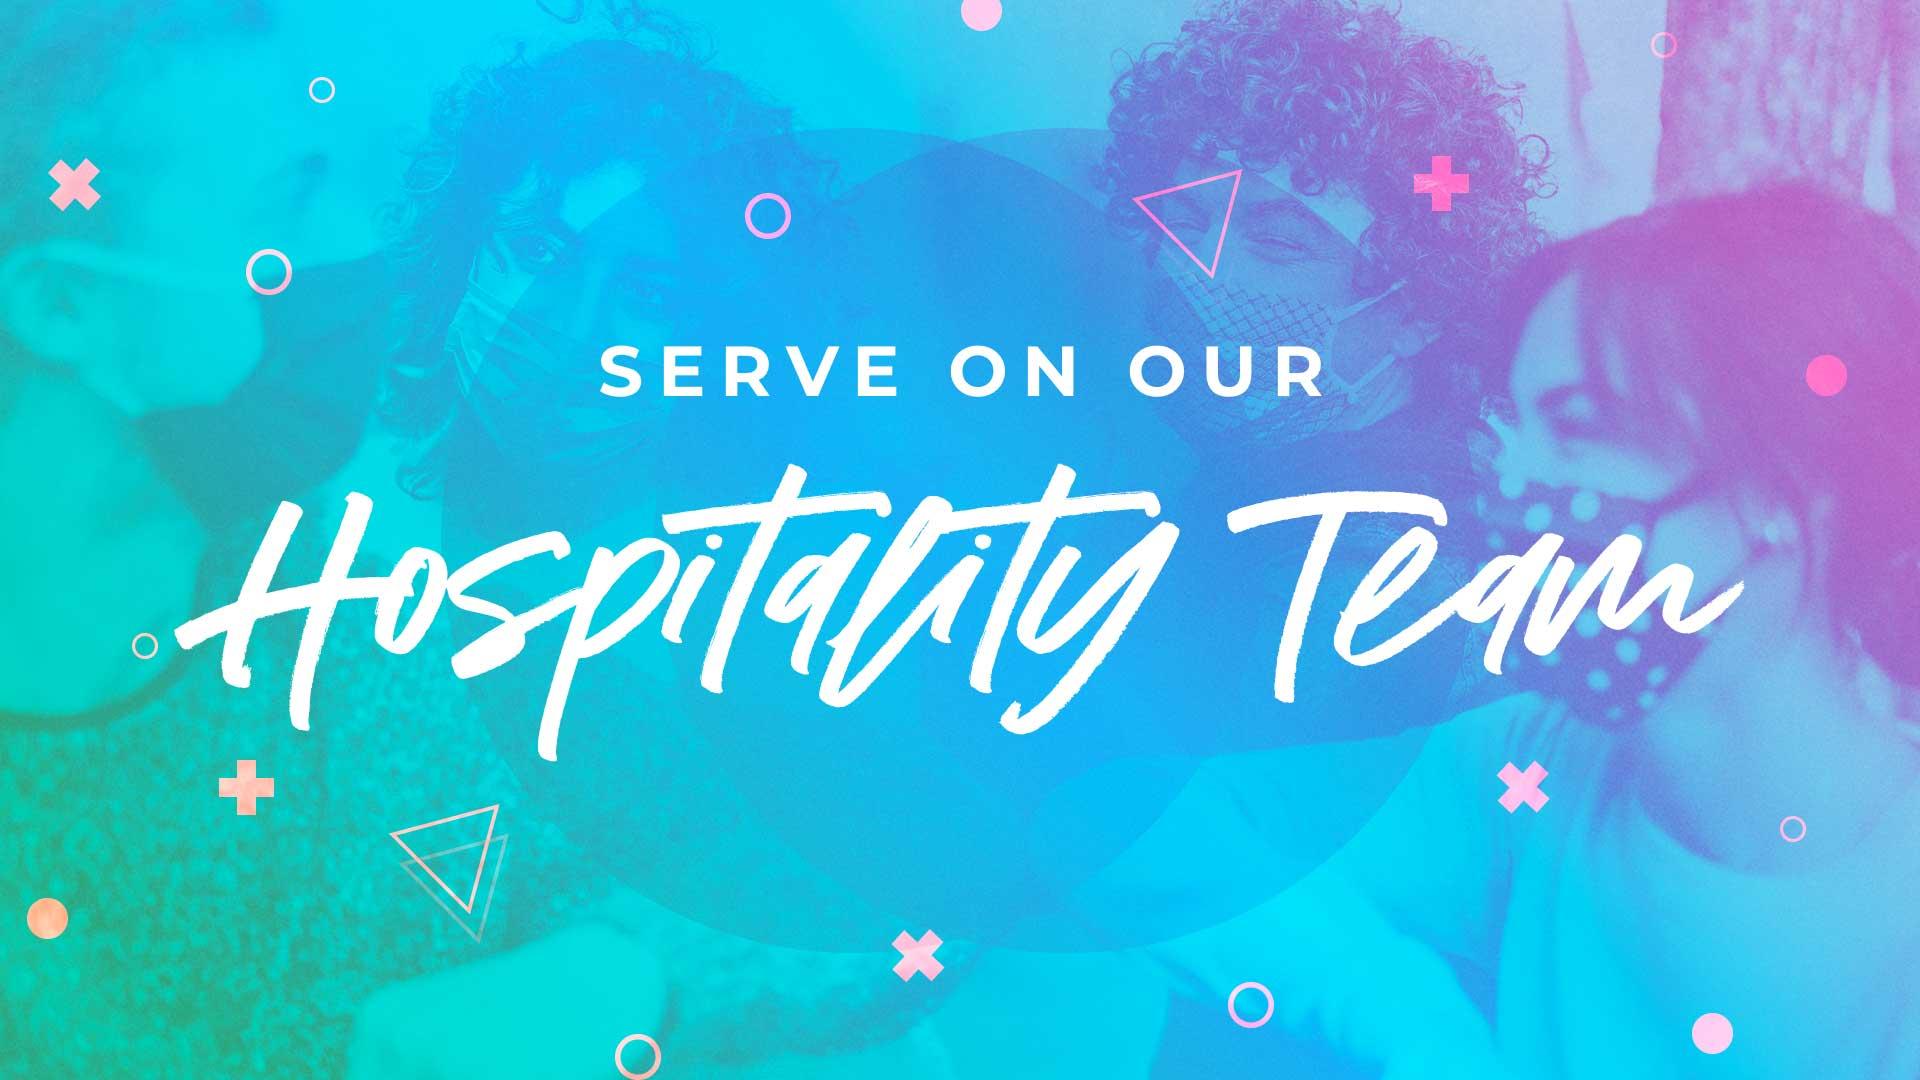 Serve on our Hospitality Team